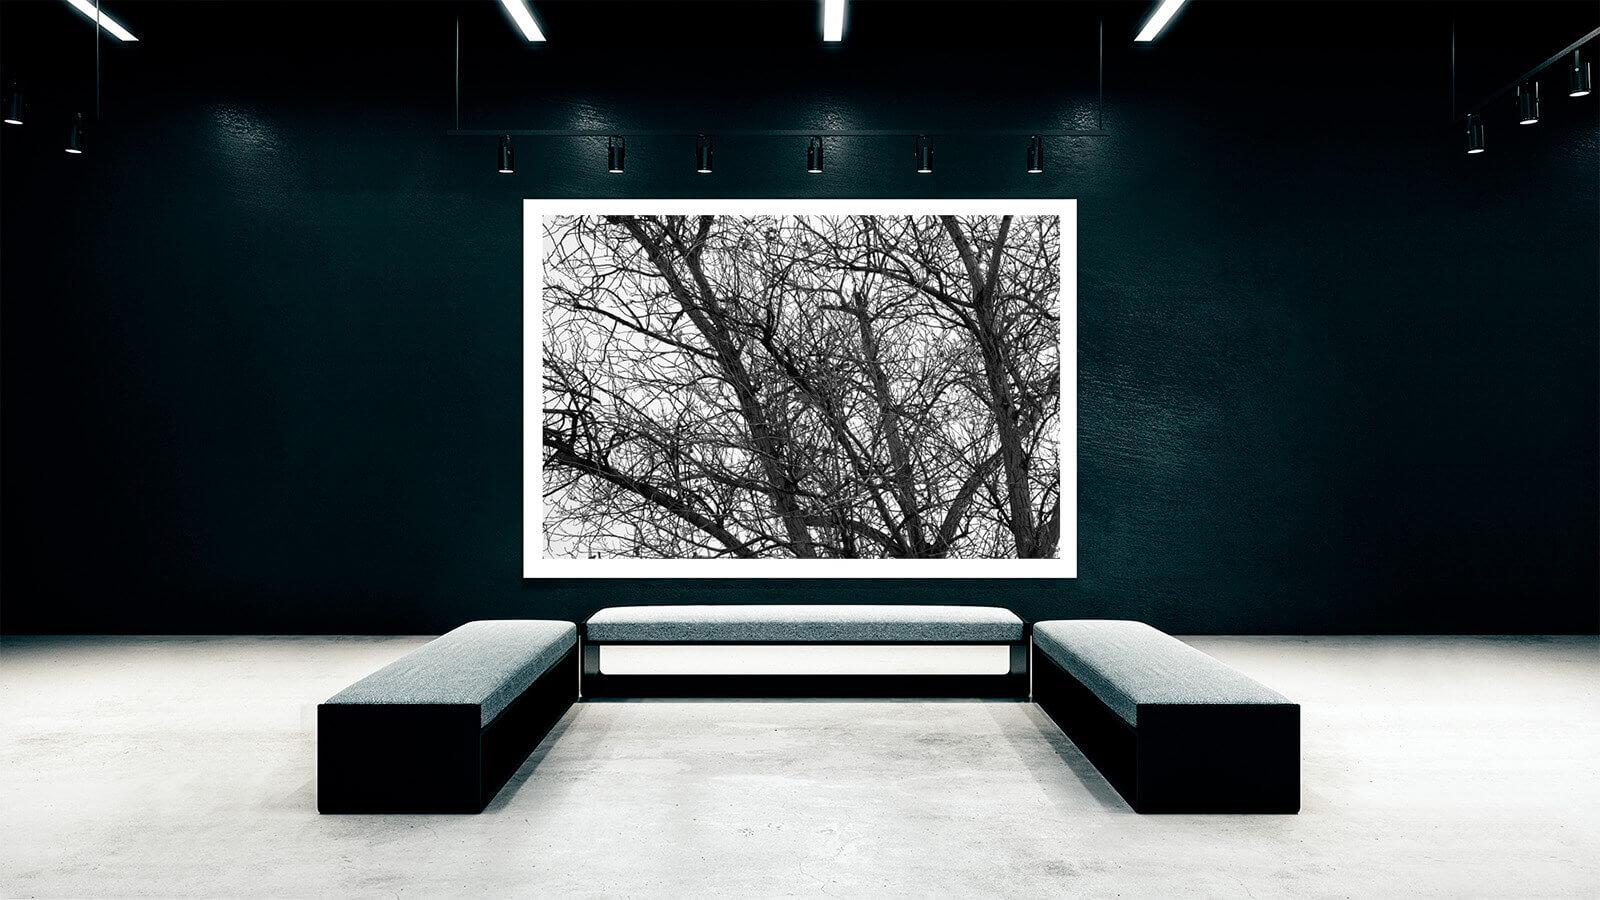 TAIYOKO-STUDIO-exposicion-Horno-Virtual-Gallery-branches-galeria-arte-fotografia-artistica-edicion-limitada-decoracion-2